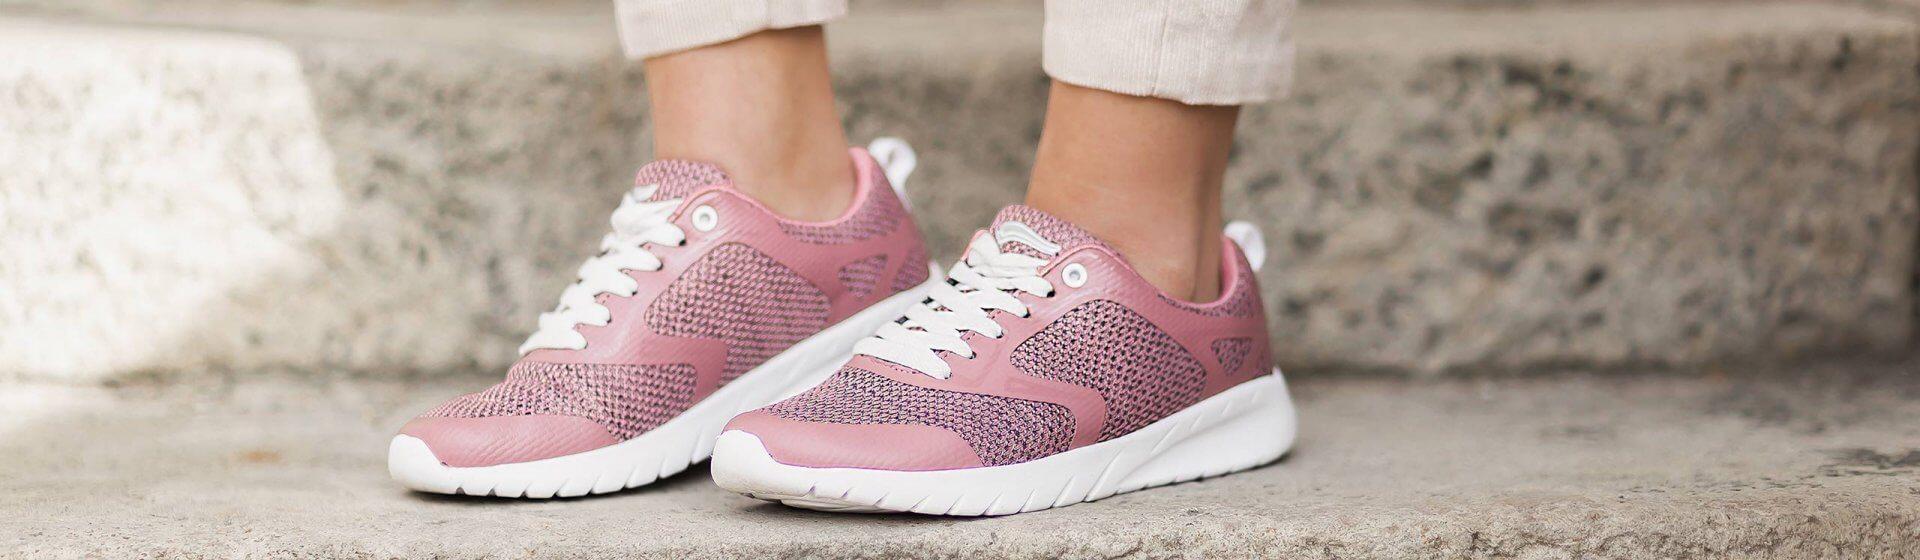 Trend Sneaker für den Frühling, Sneaker Trends 2020, Shoelove by Deichmann